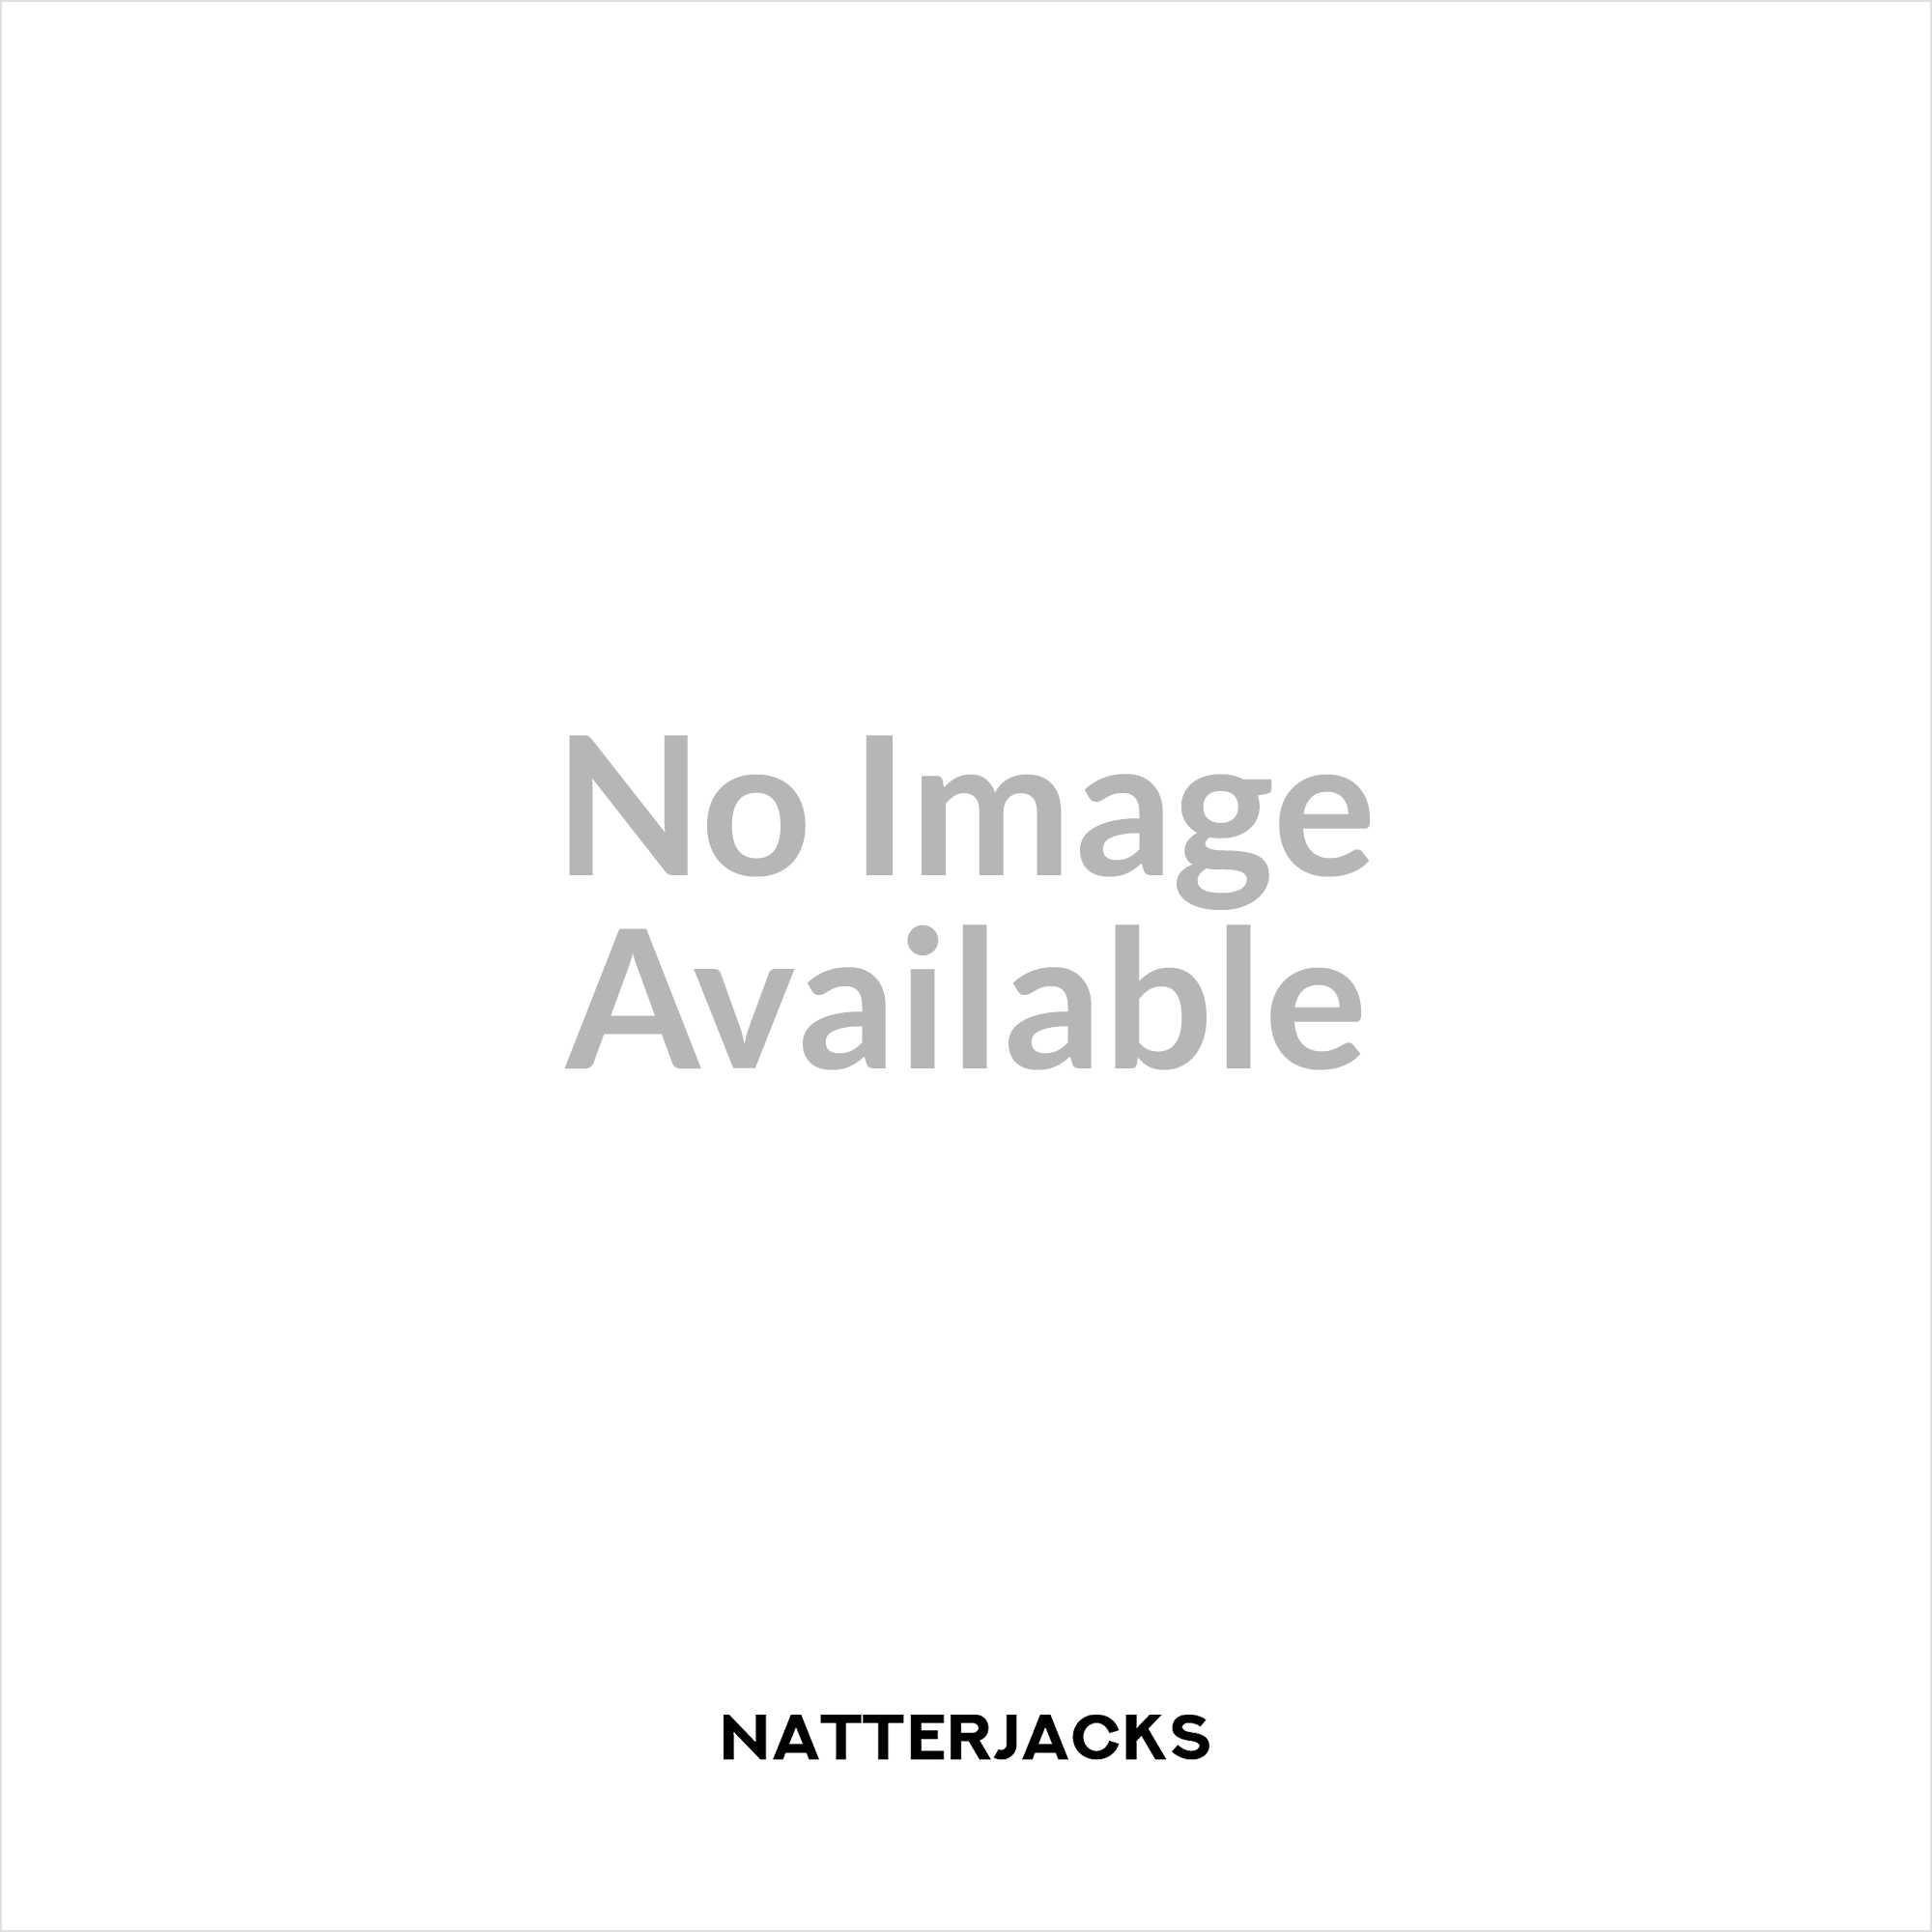 705d0666 Carhartt College Left Long Sleeve Tee in Black/White